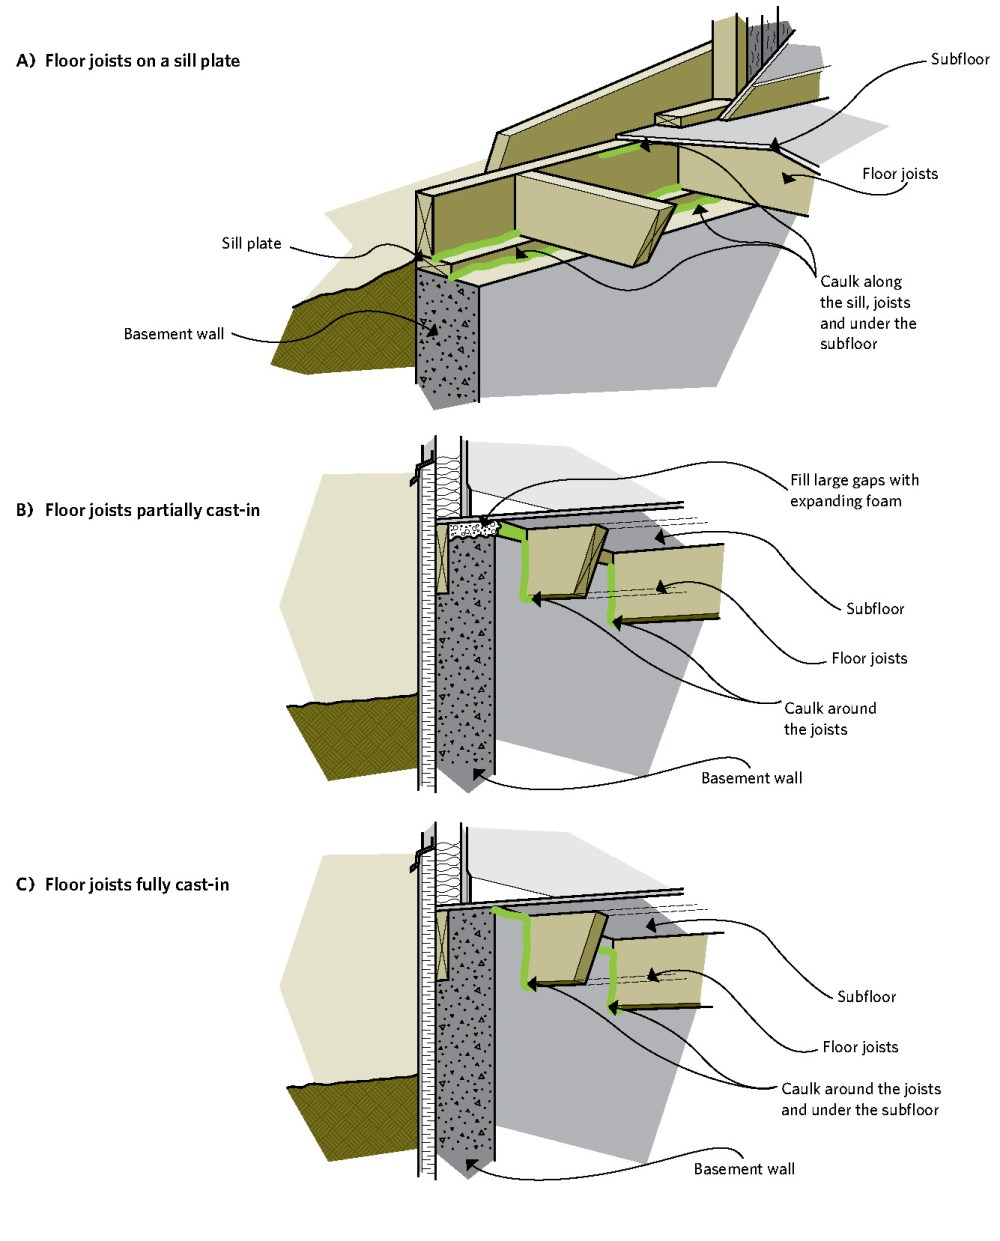 medium resolution of figure 6 18 reducing air leakage in the joist header area